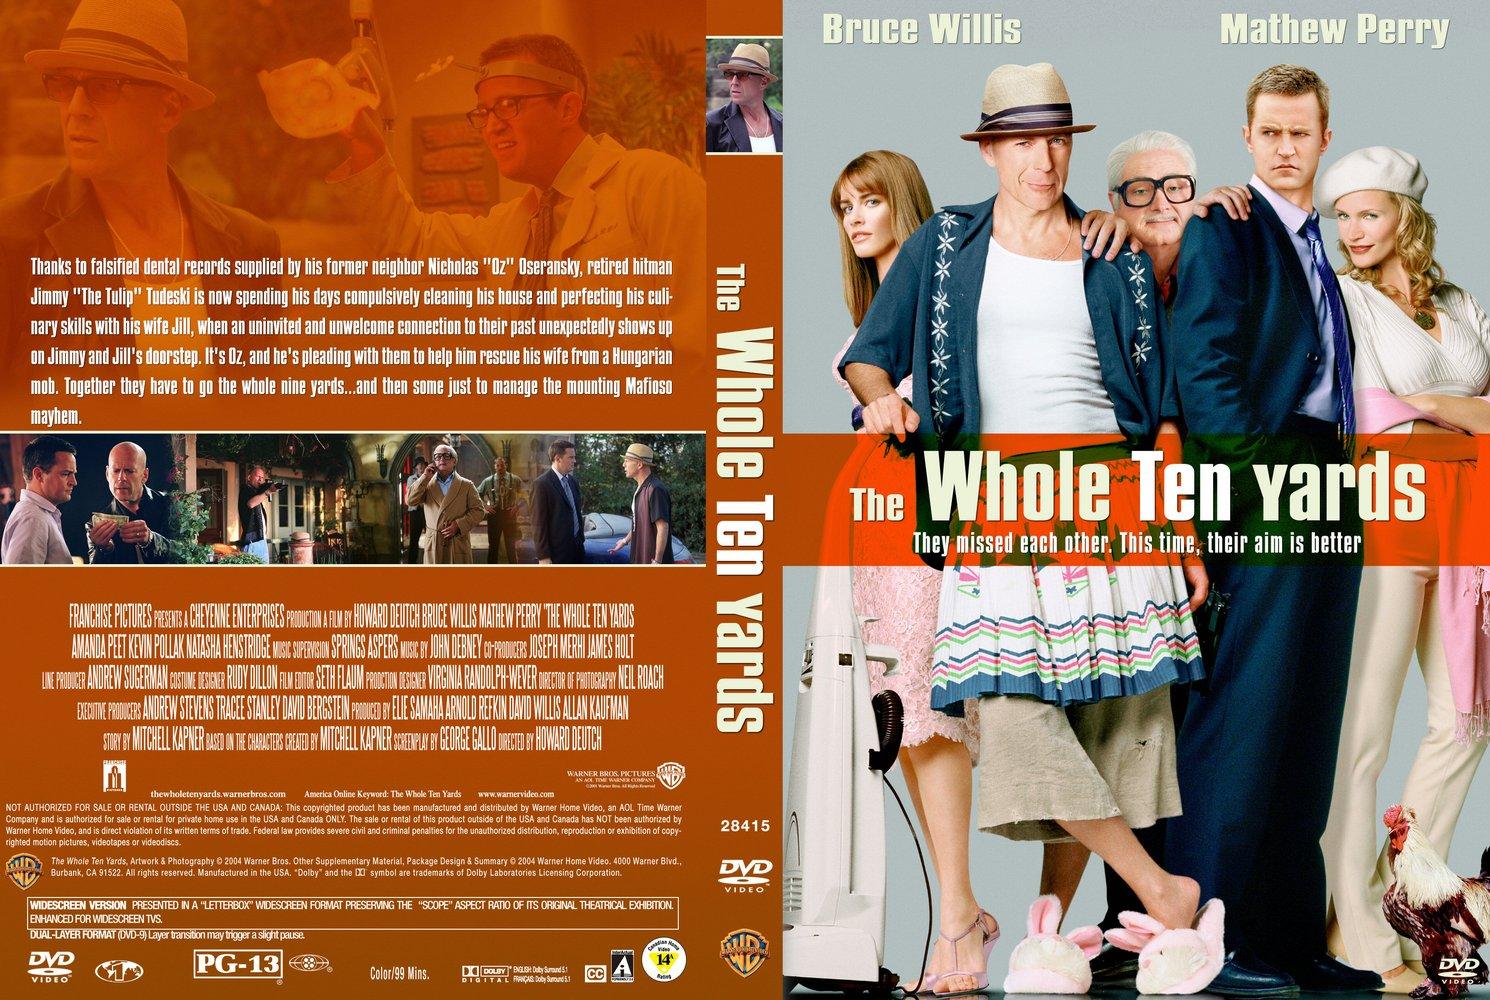 http://4.bp.blogspot.com/-AF9eUC3Y4mE/ThFPnHGVEII/AAAAAAAABHk/ddW84I4s8T8/s1600/The+Whole+Ten+Yards+FRONT1.jpg